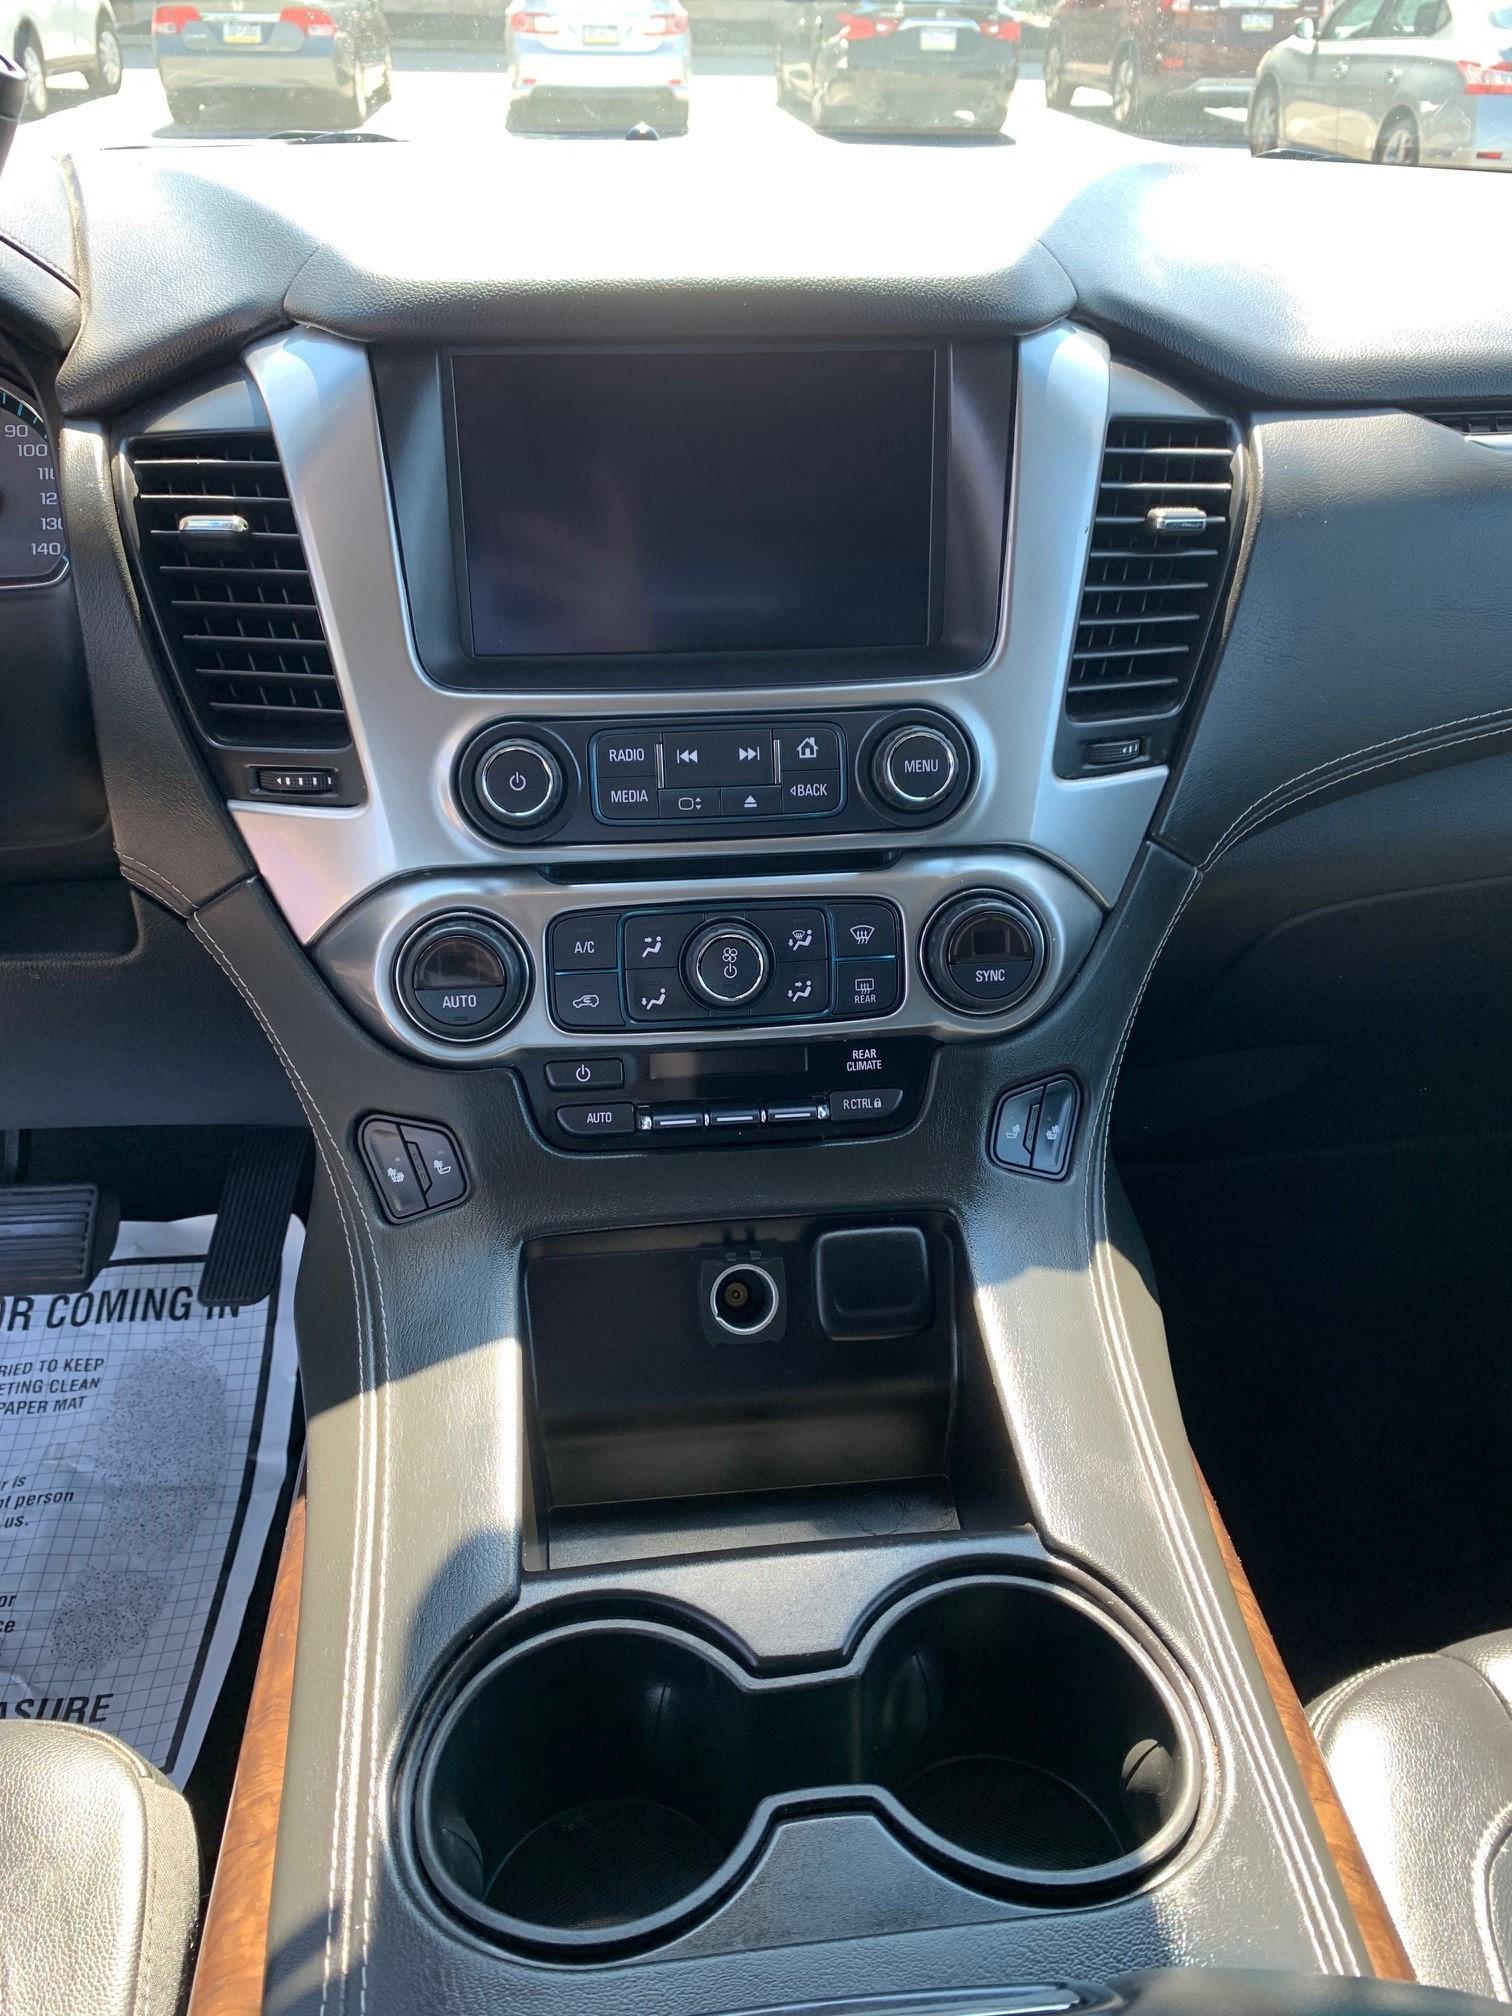 car entertainment center